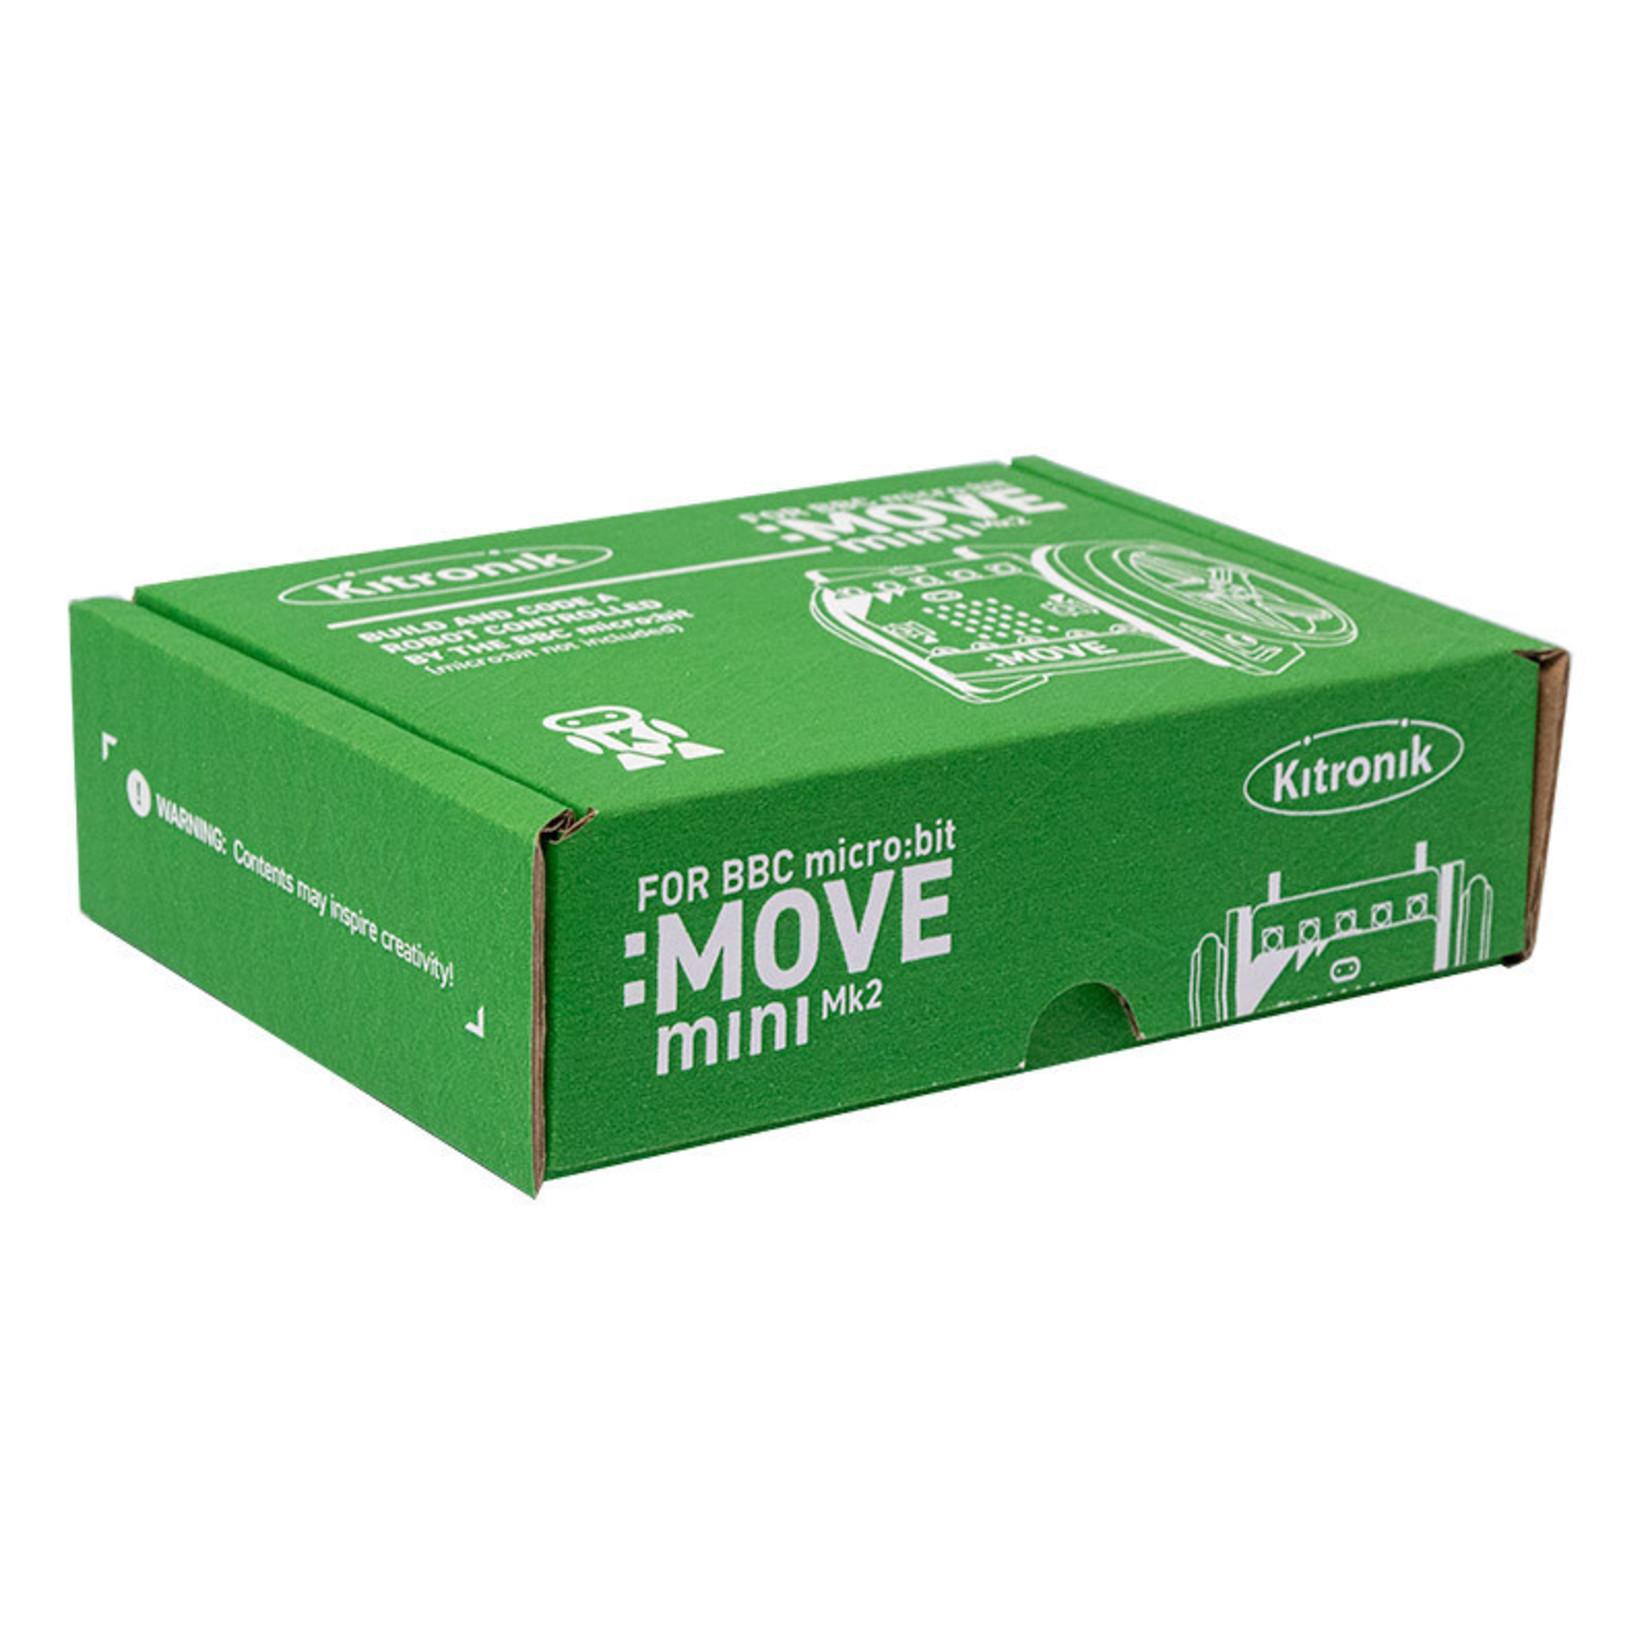 Kitronik :MOVE mini MK2 (excl micro:bit)